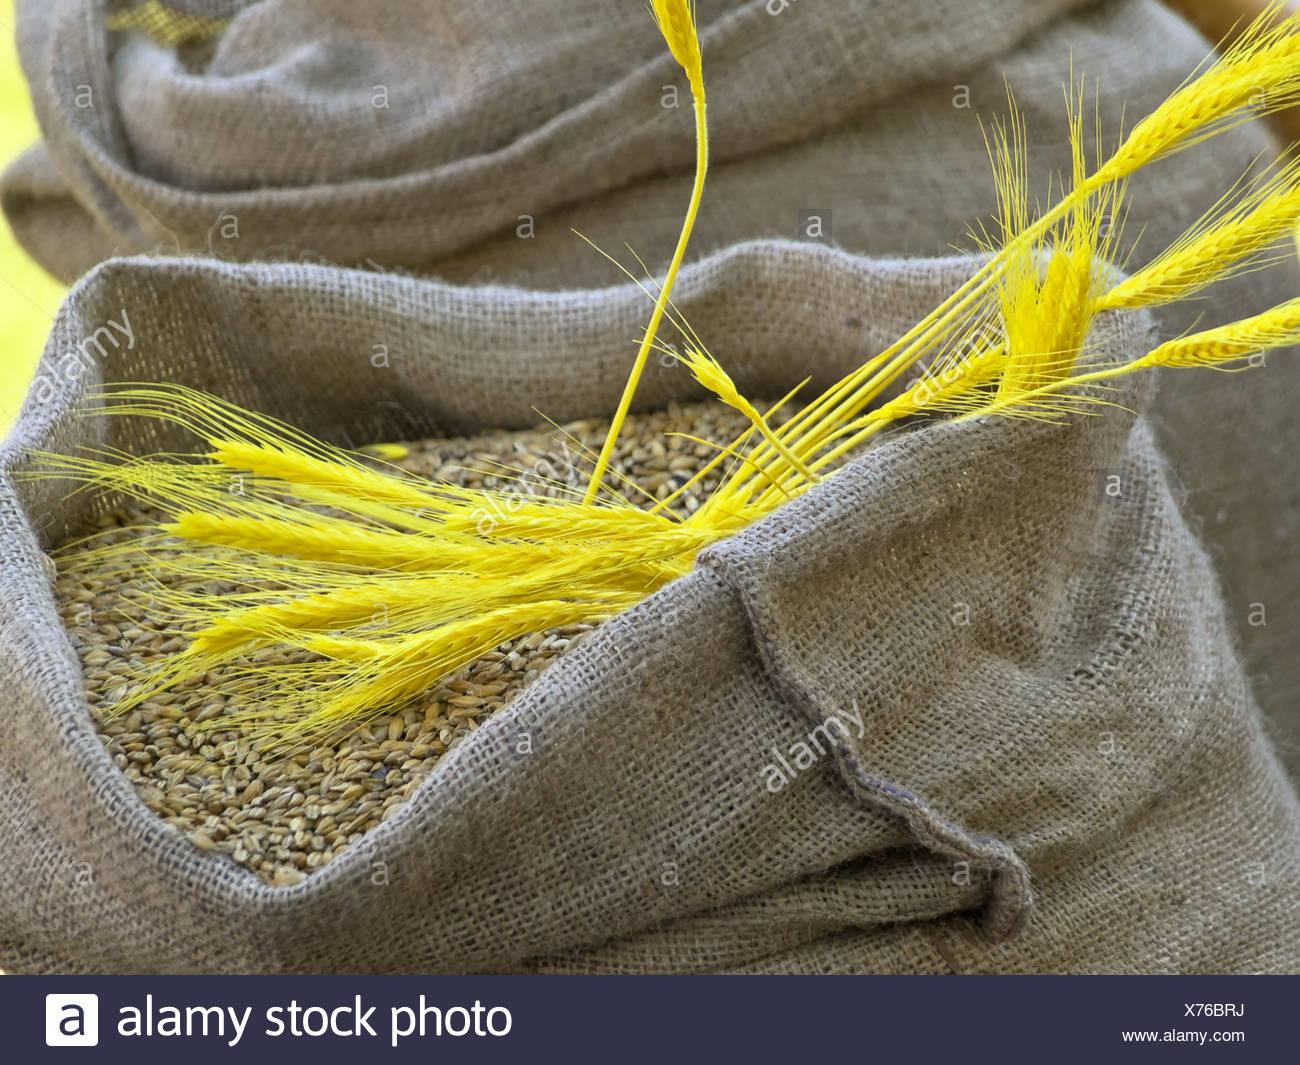 sacks of grain - Stock Image